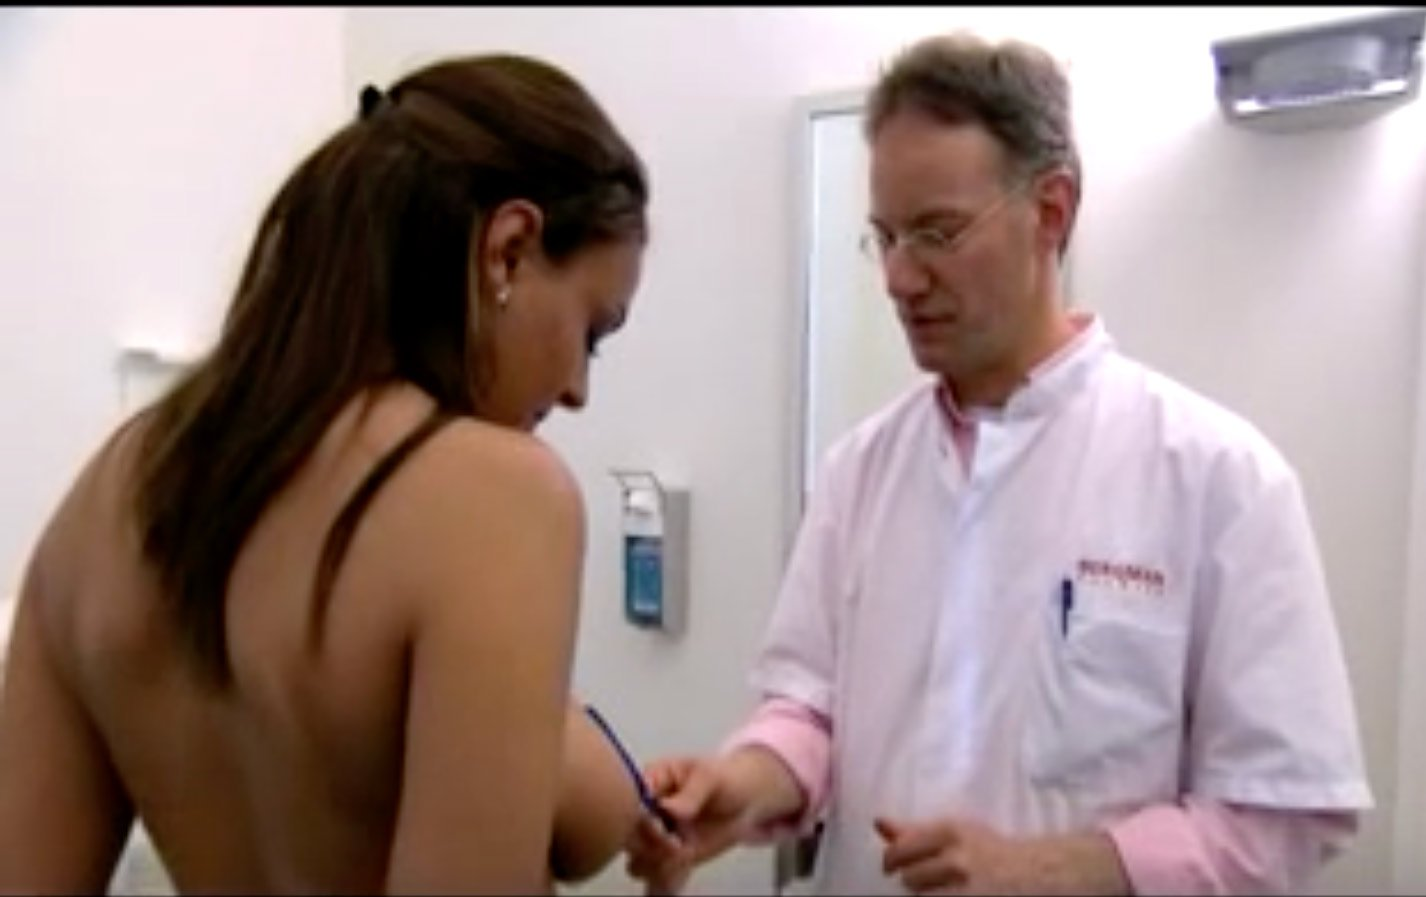 Video Bruststraffung Dr Sylvester M Maas MAAS AeSTHETICS.ch